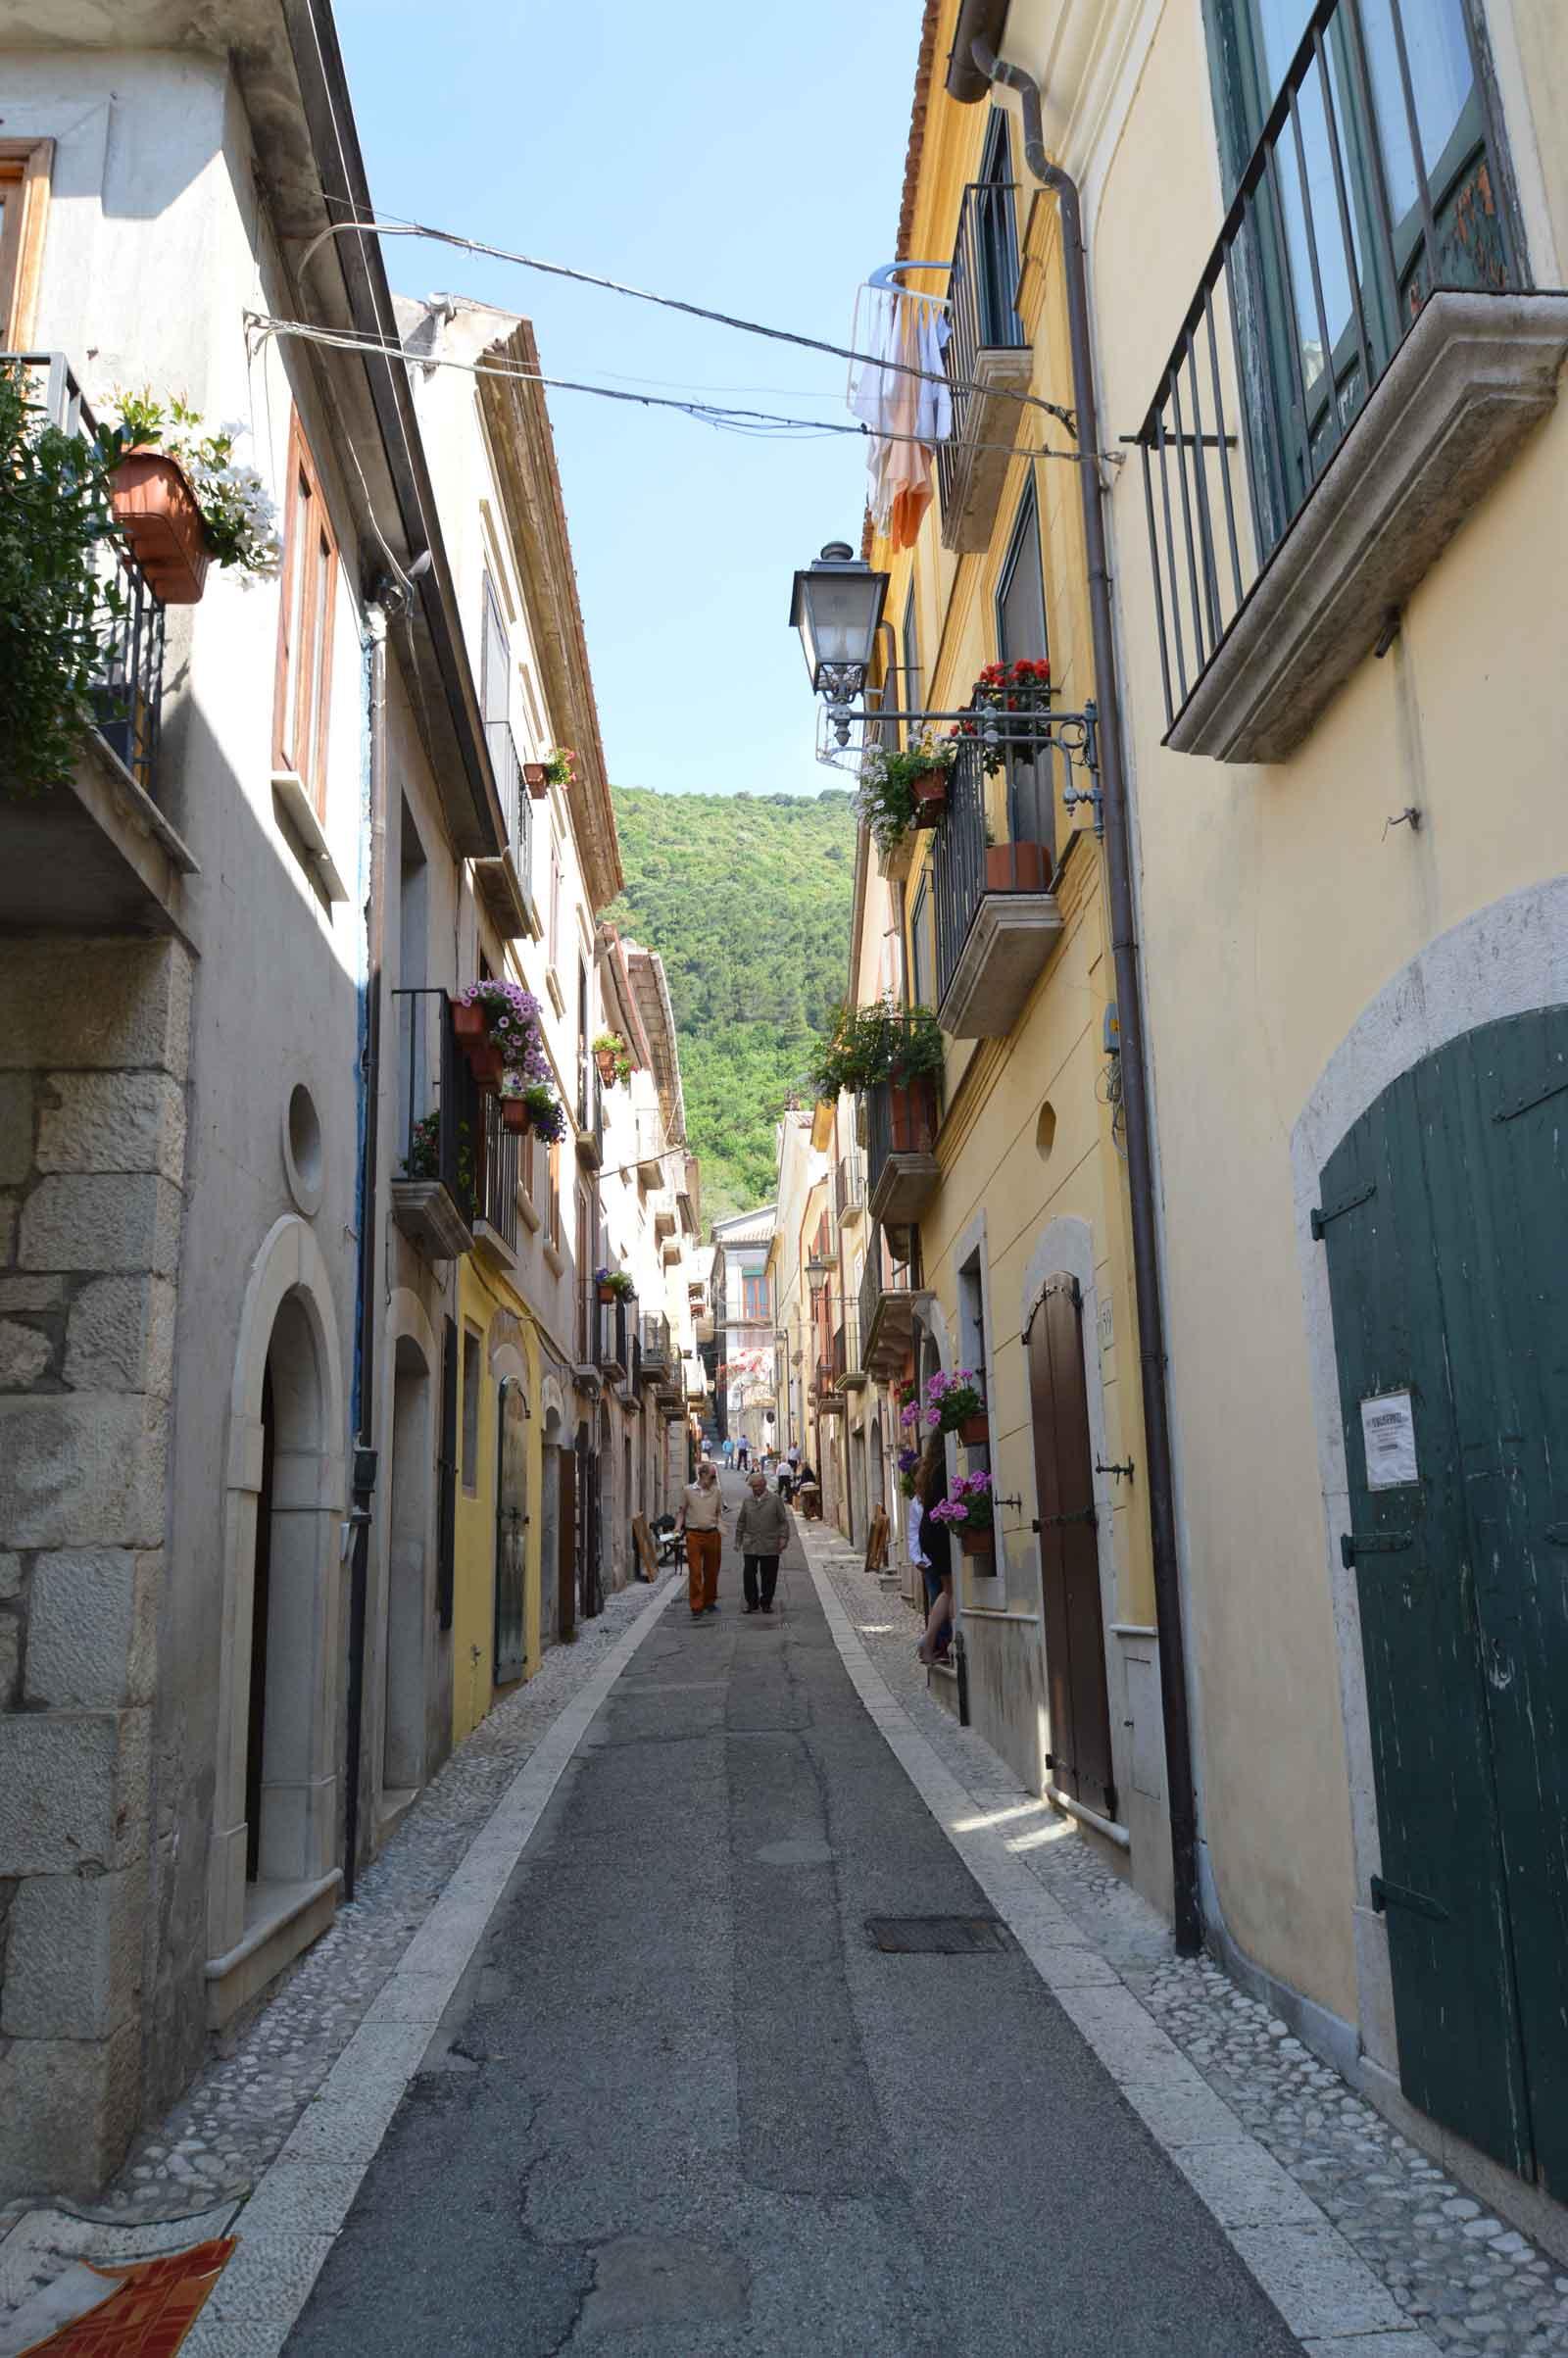 Walking tour a san lorenzello guida turistica del matese for San lorenzello